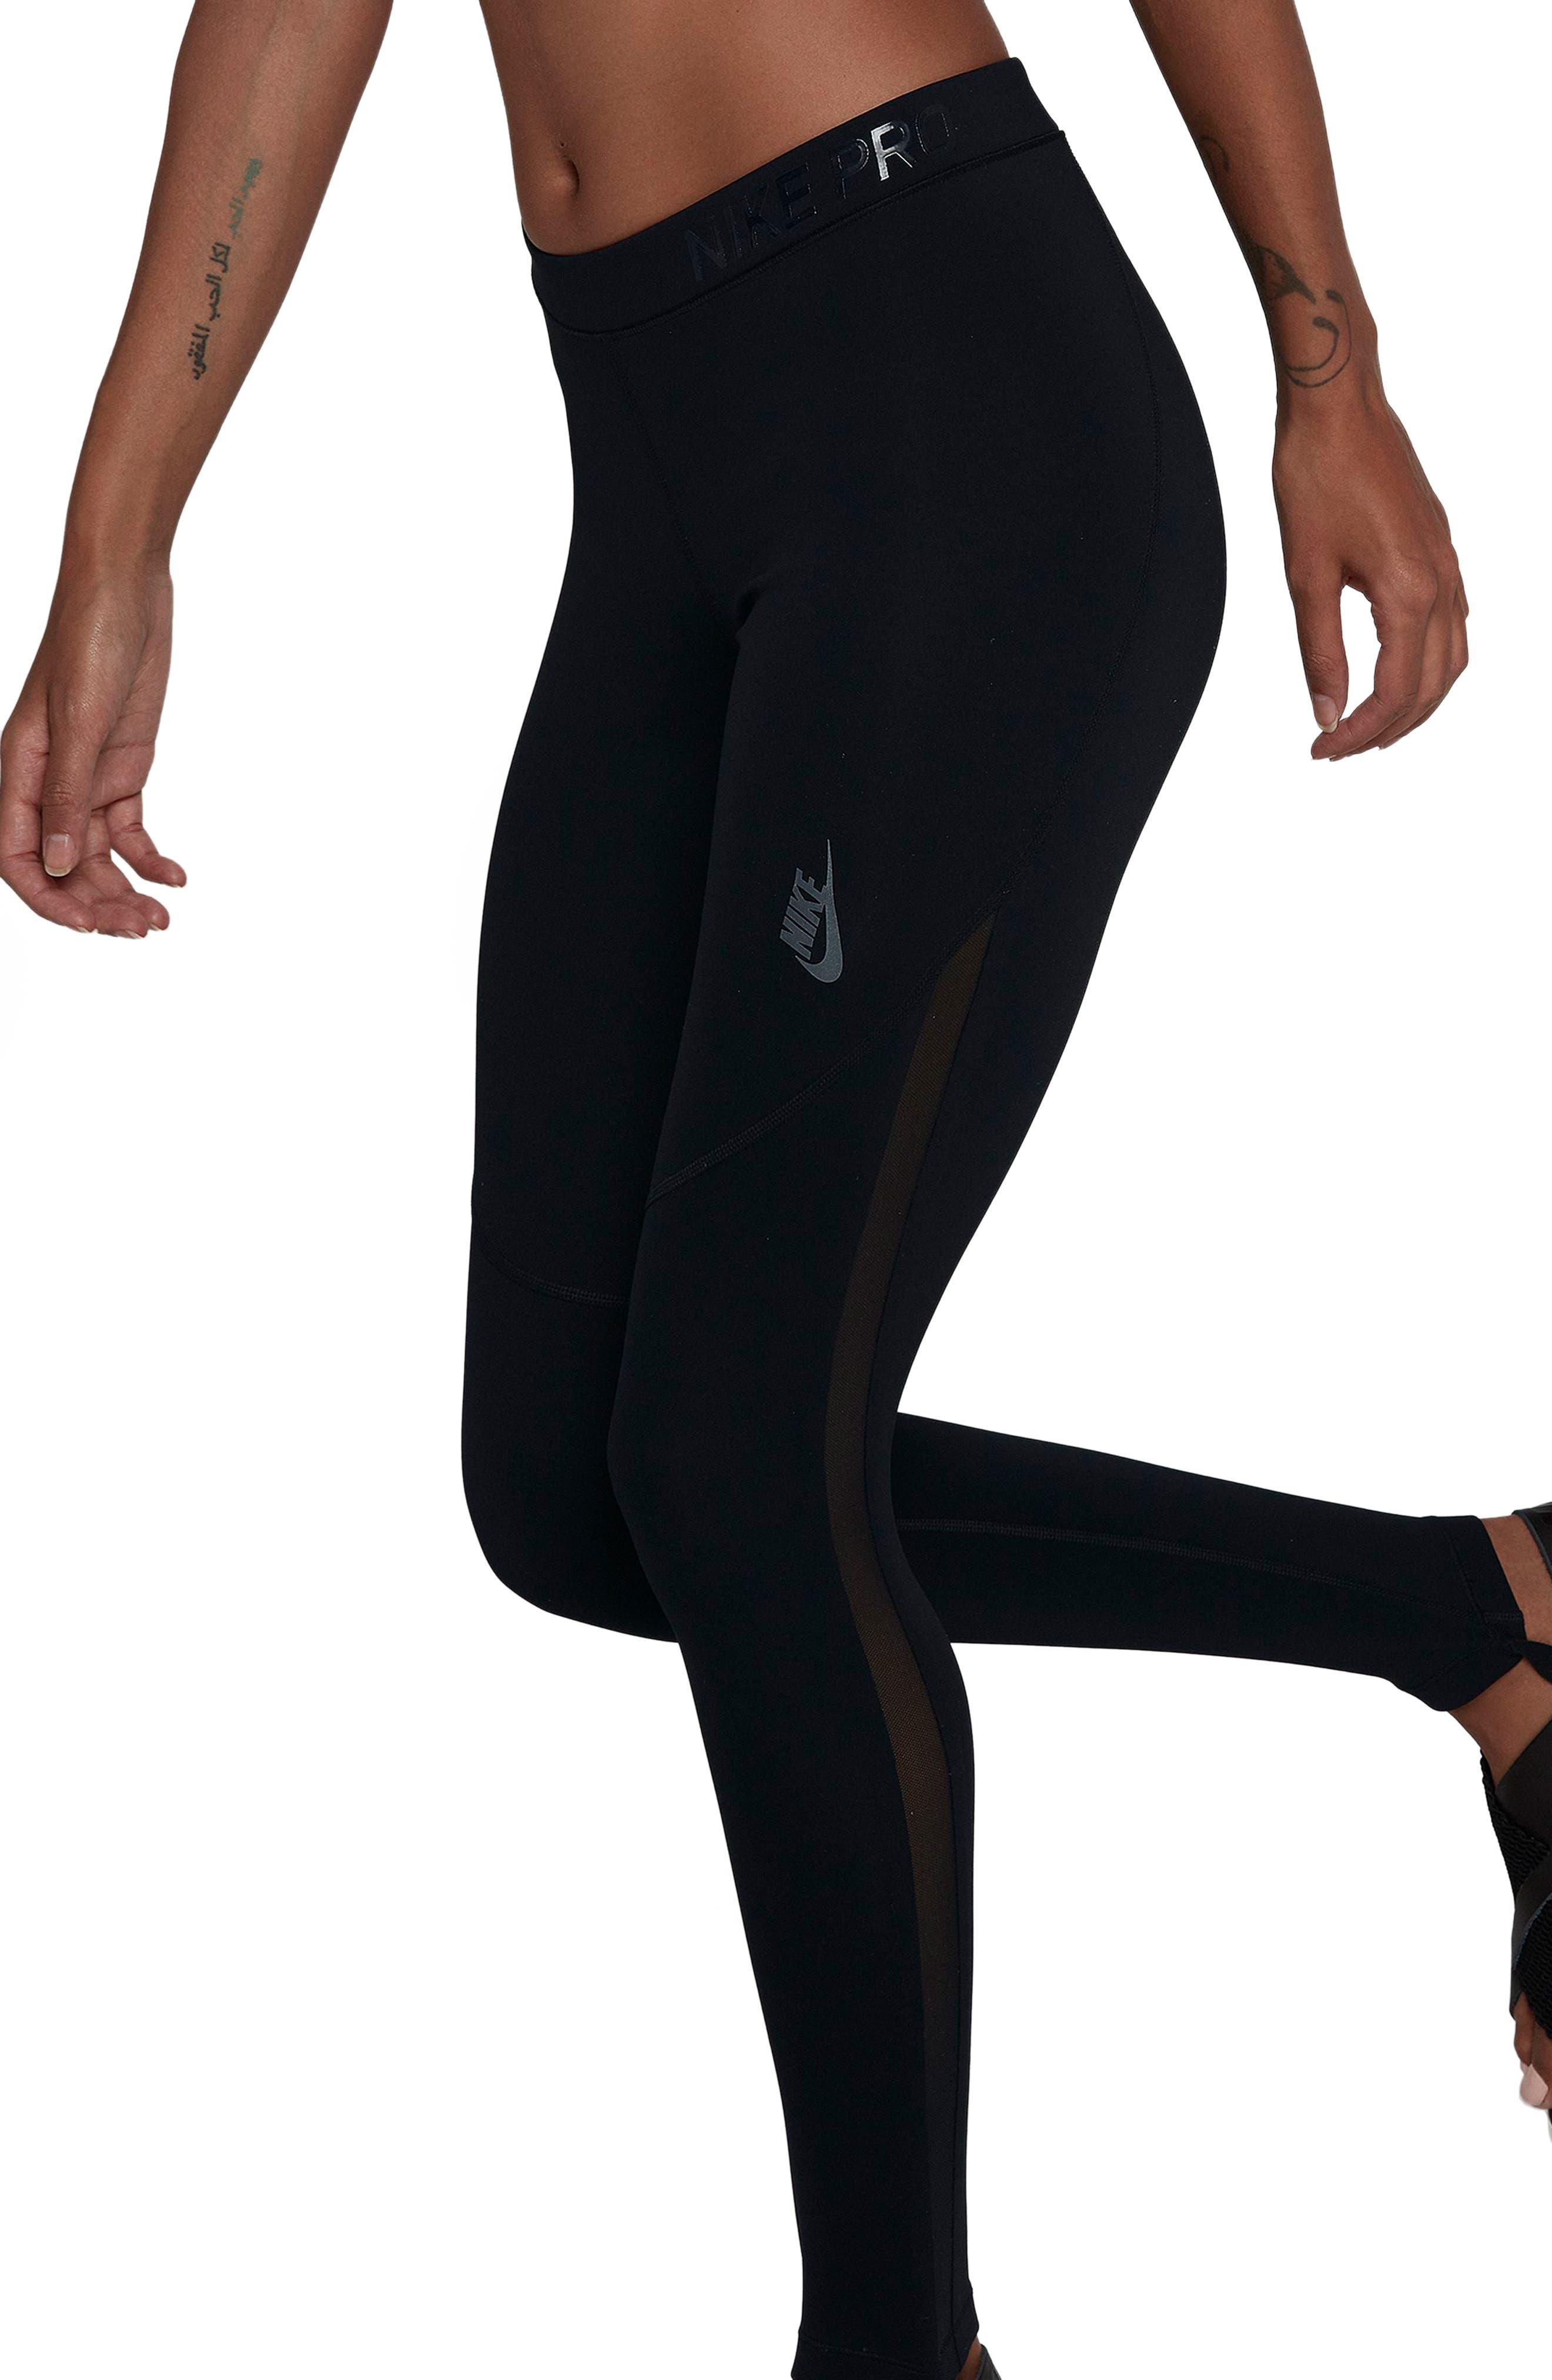 NikeLab NK One Tights,                         Main,                         color, Black